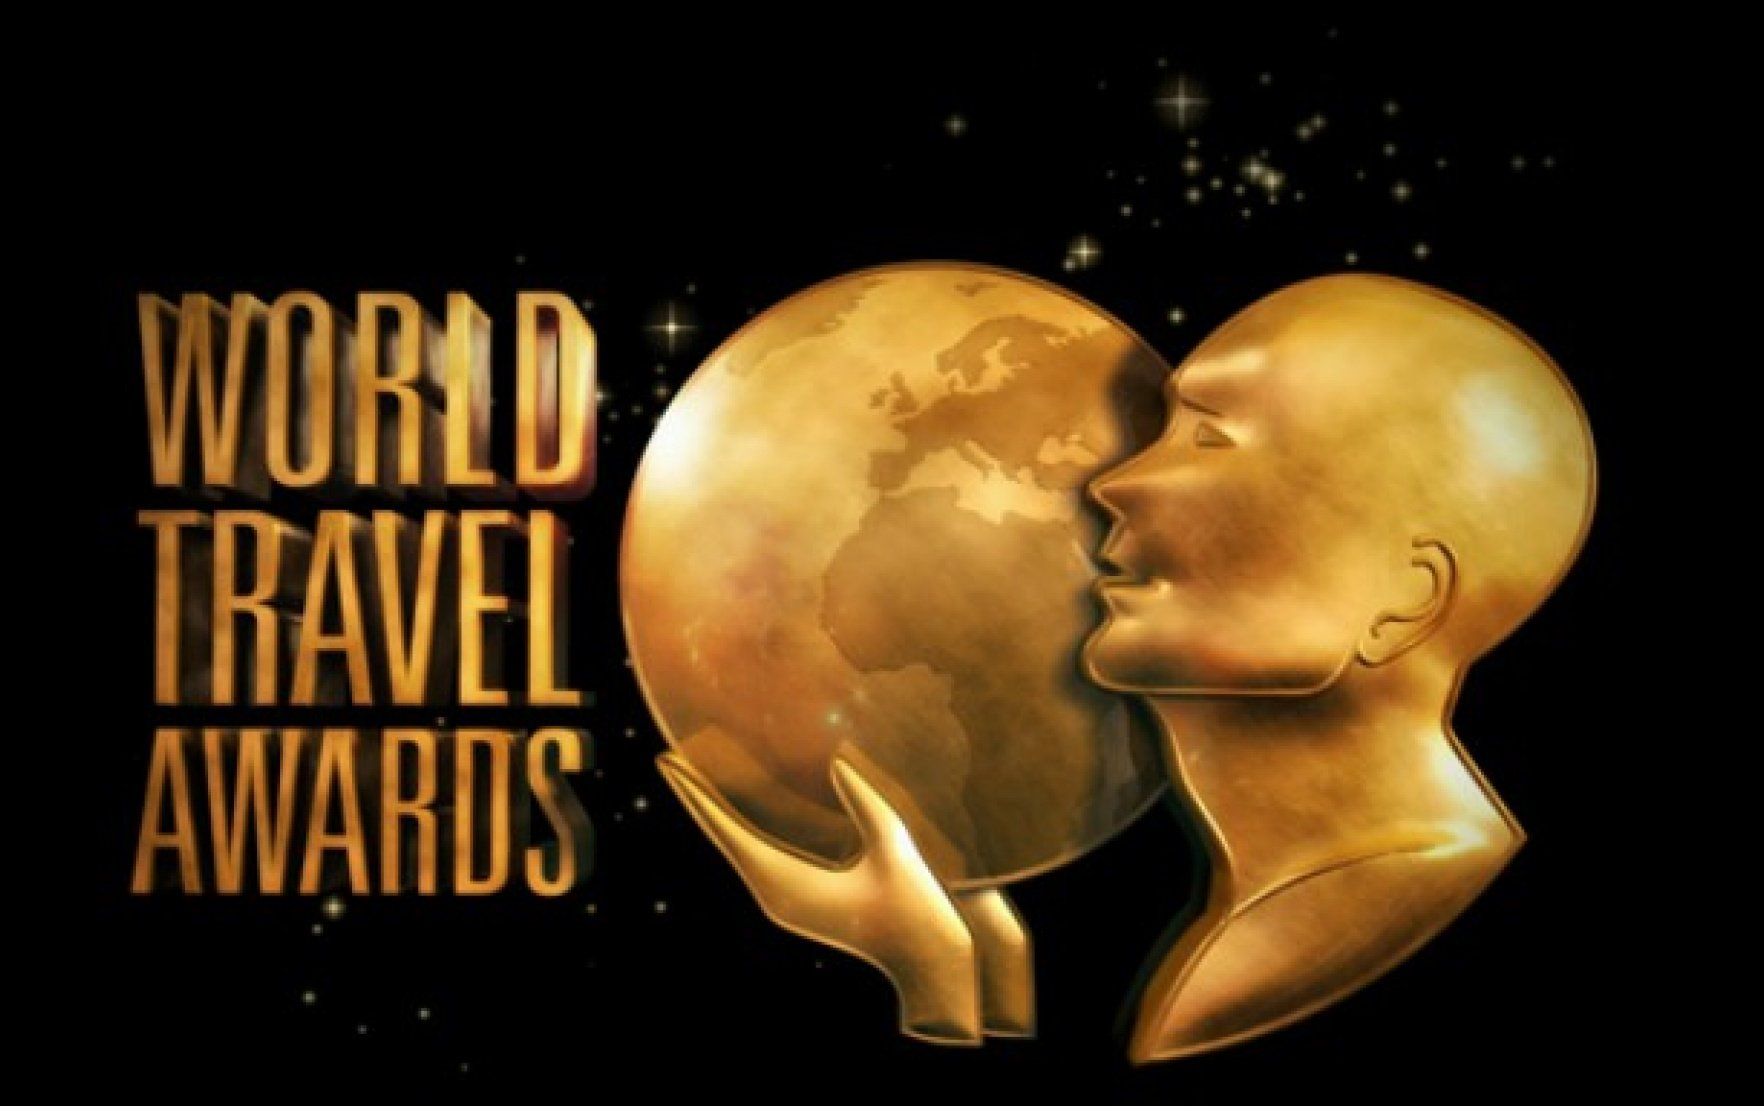 World Travel Awards Emblem